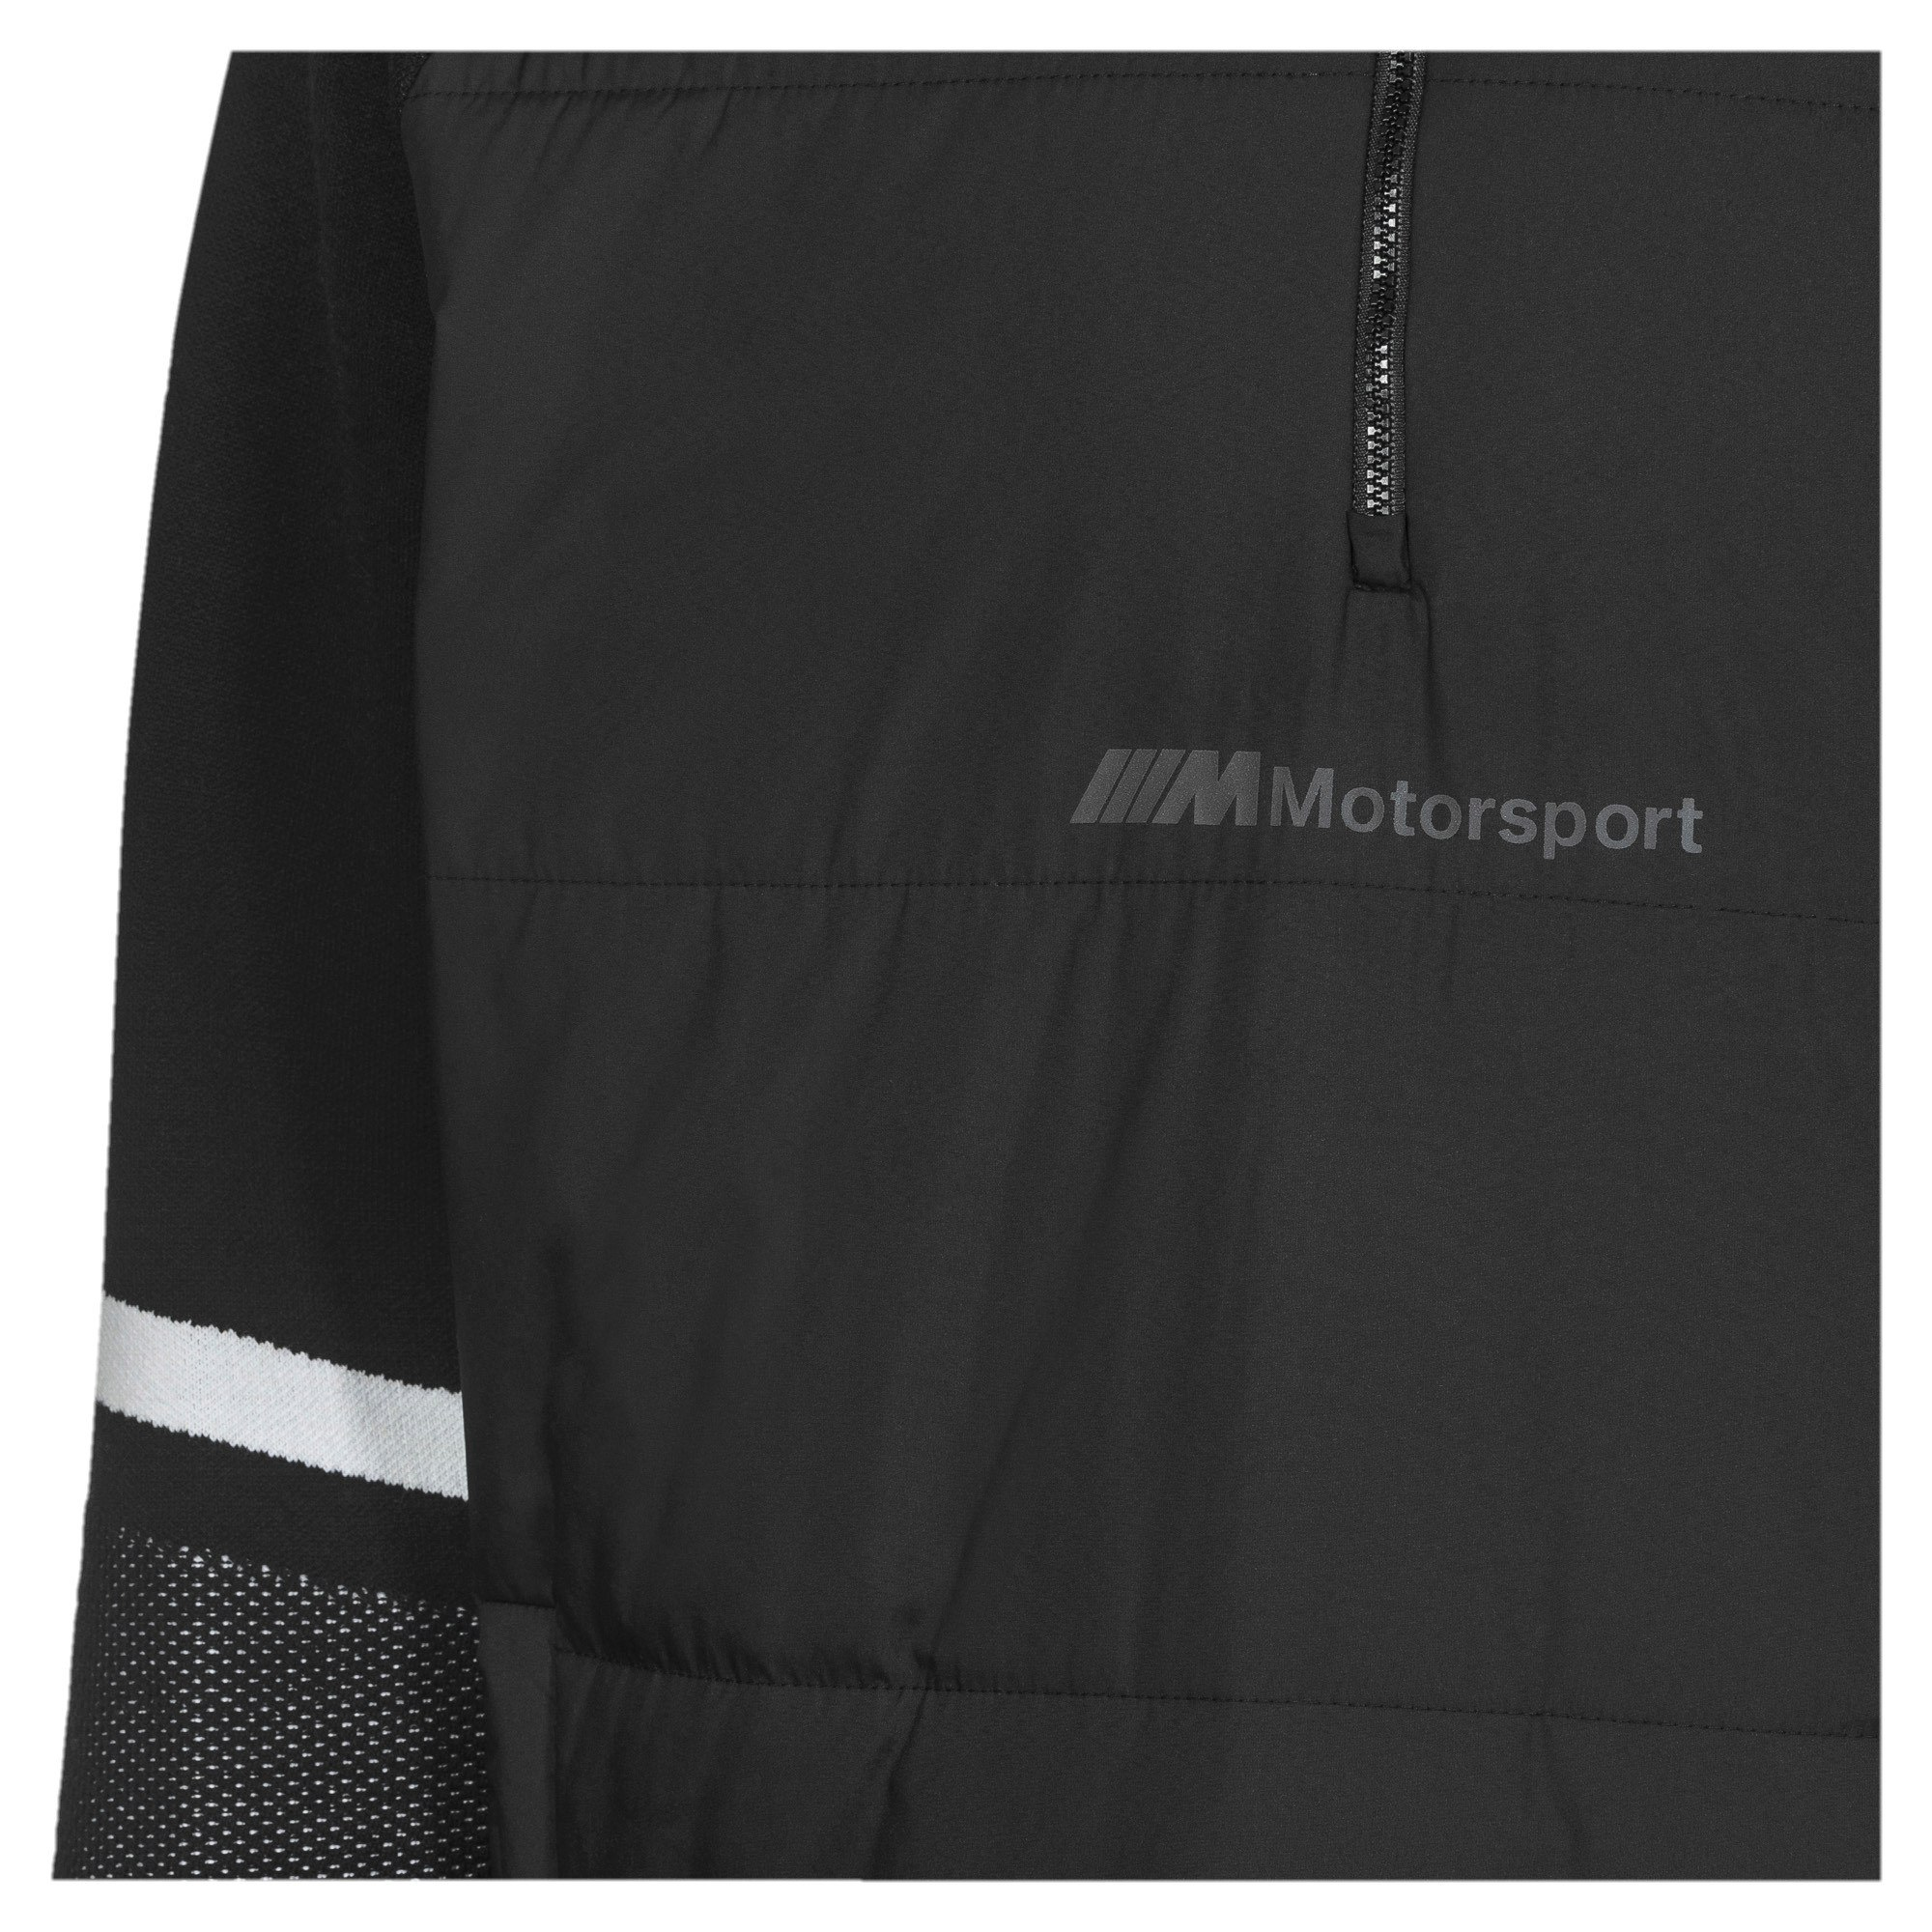 Thumbnail 3 of BMW Motorsport evoKNIT Knitted Men's Sweater, Puma Black, medium